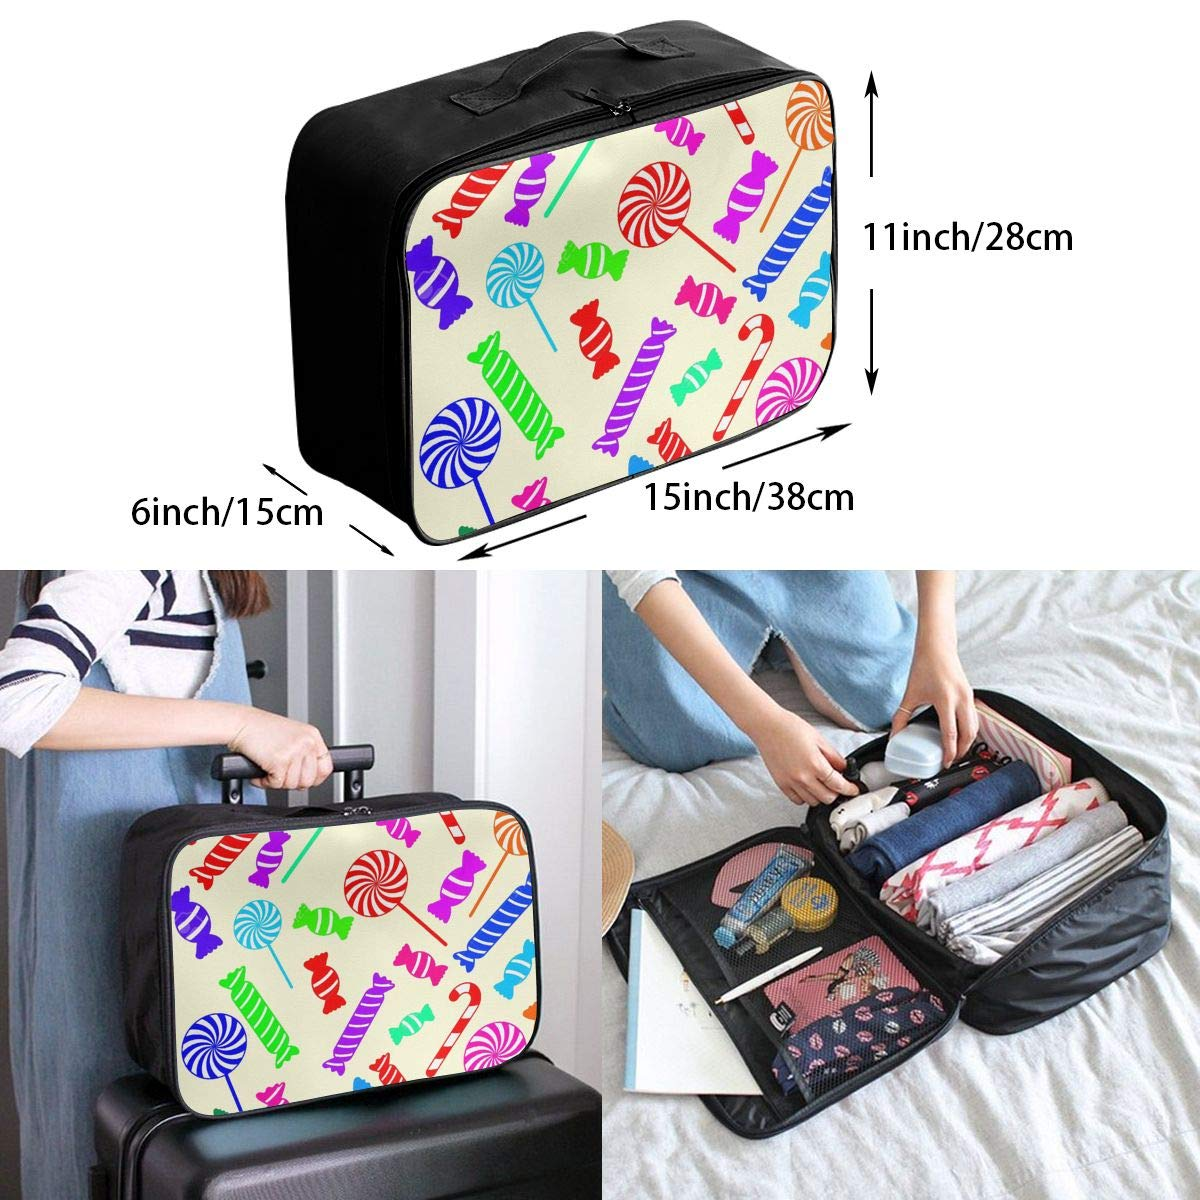 Travel Luggage Duffle Bag Lightweight Portable Handbag Candy Cane Large Capacity Waterproof Foldable Storage Tote